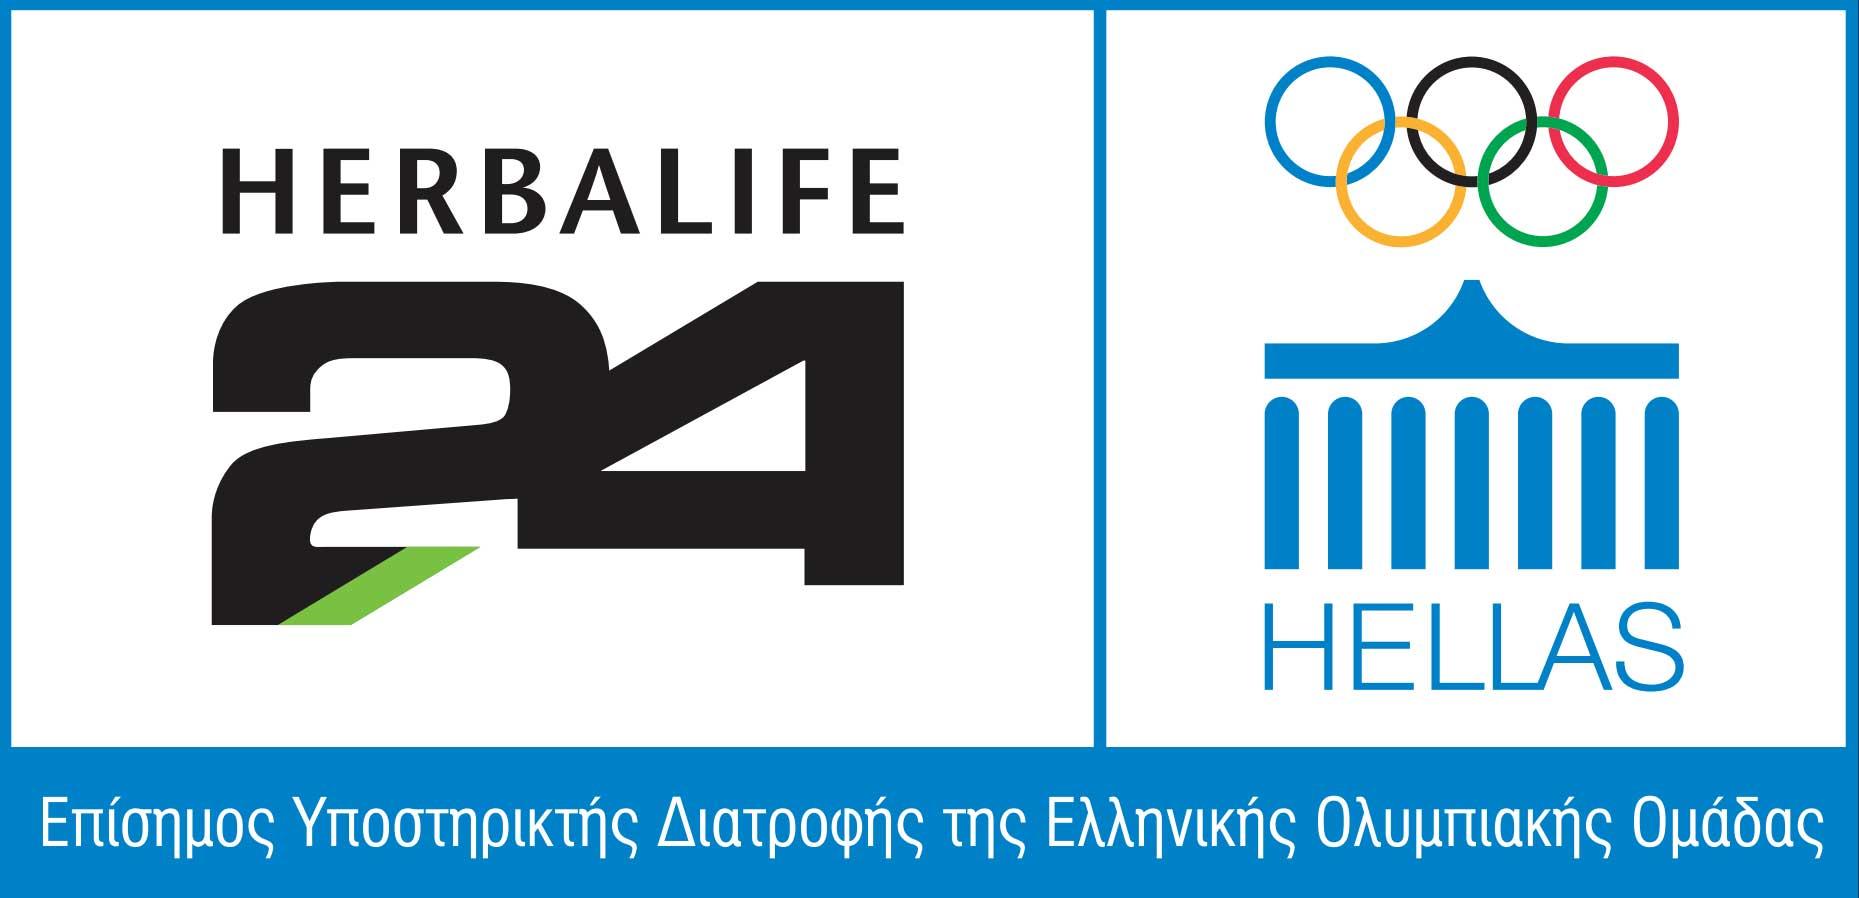 H σειρά Herbalife 24 της Herbalife Nutrition Επίσημος Υποστηρικτής Διατροφής της Ελληνικής Ολυμπιακής Ομάδας